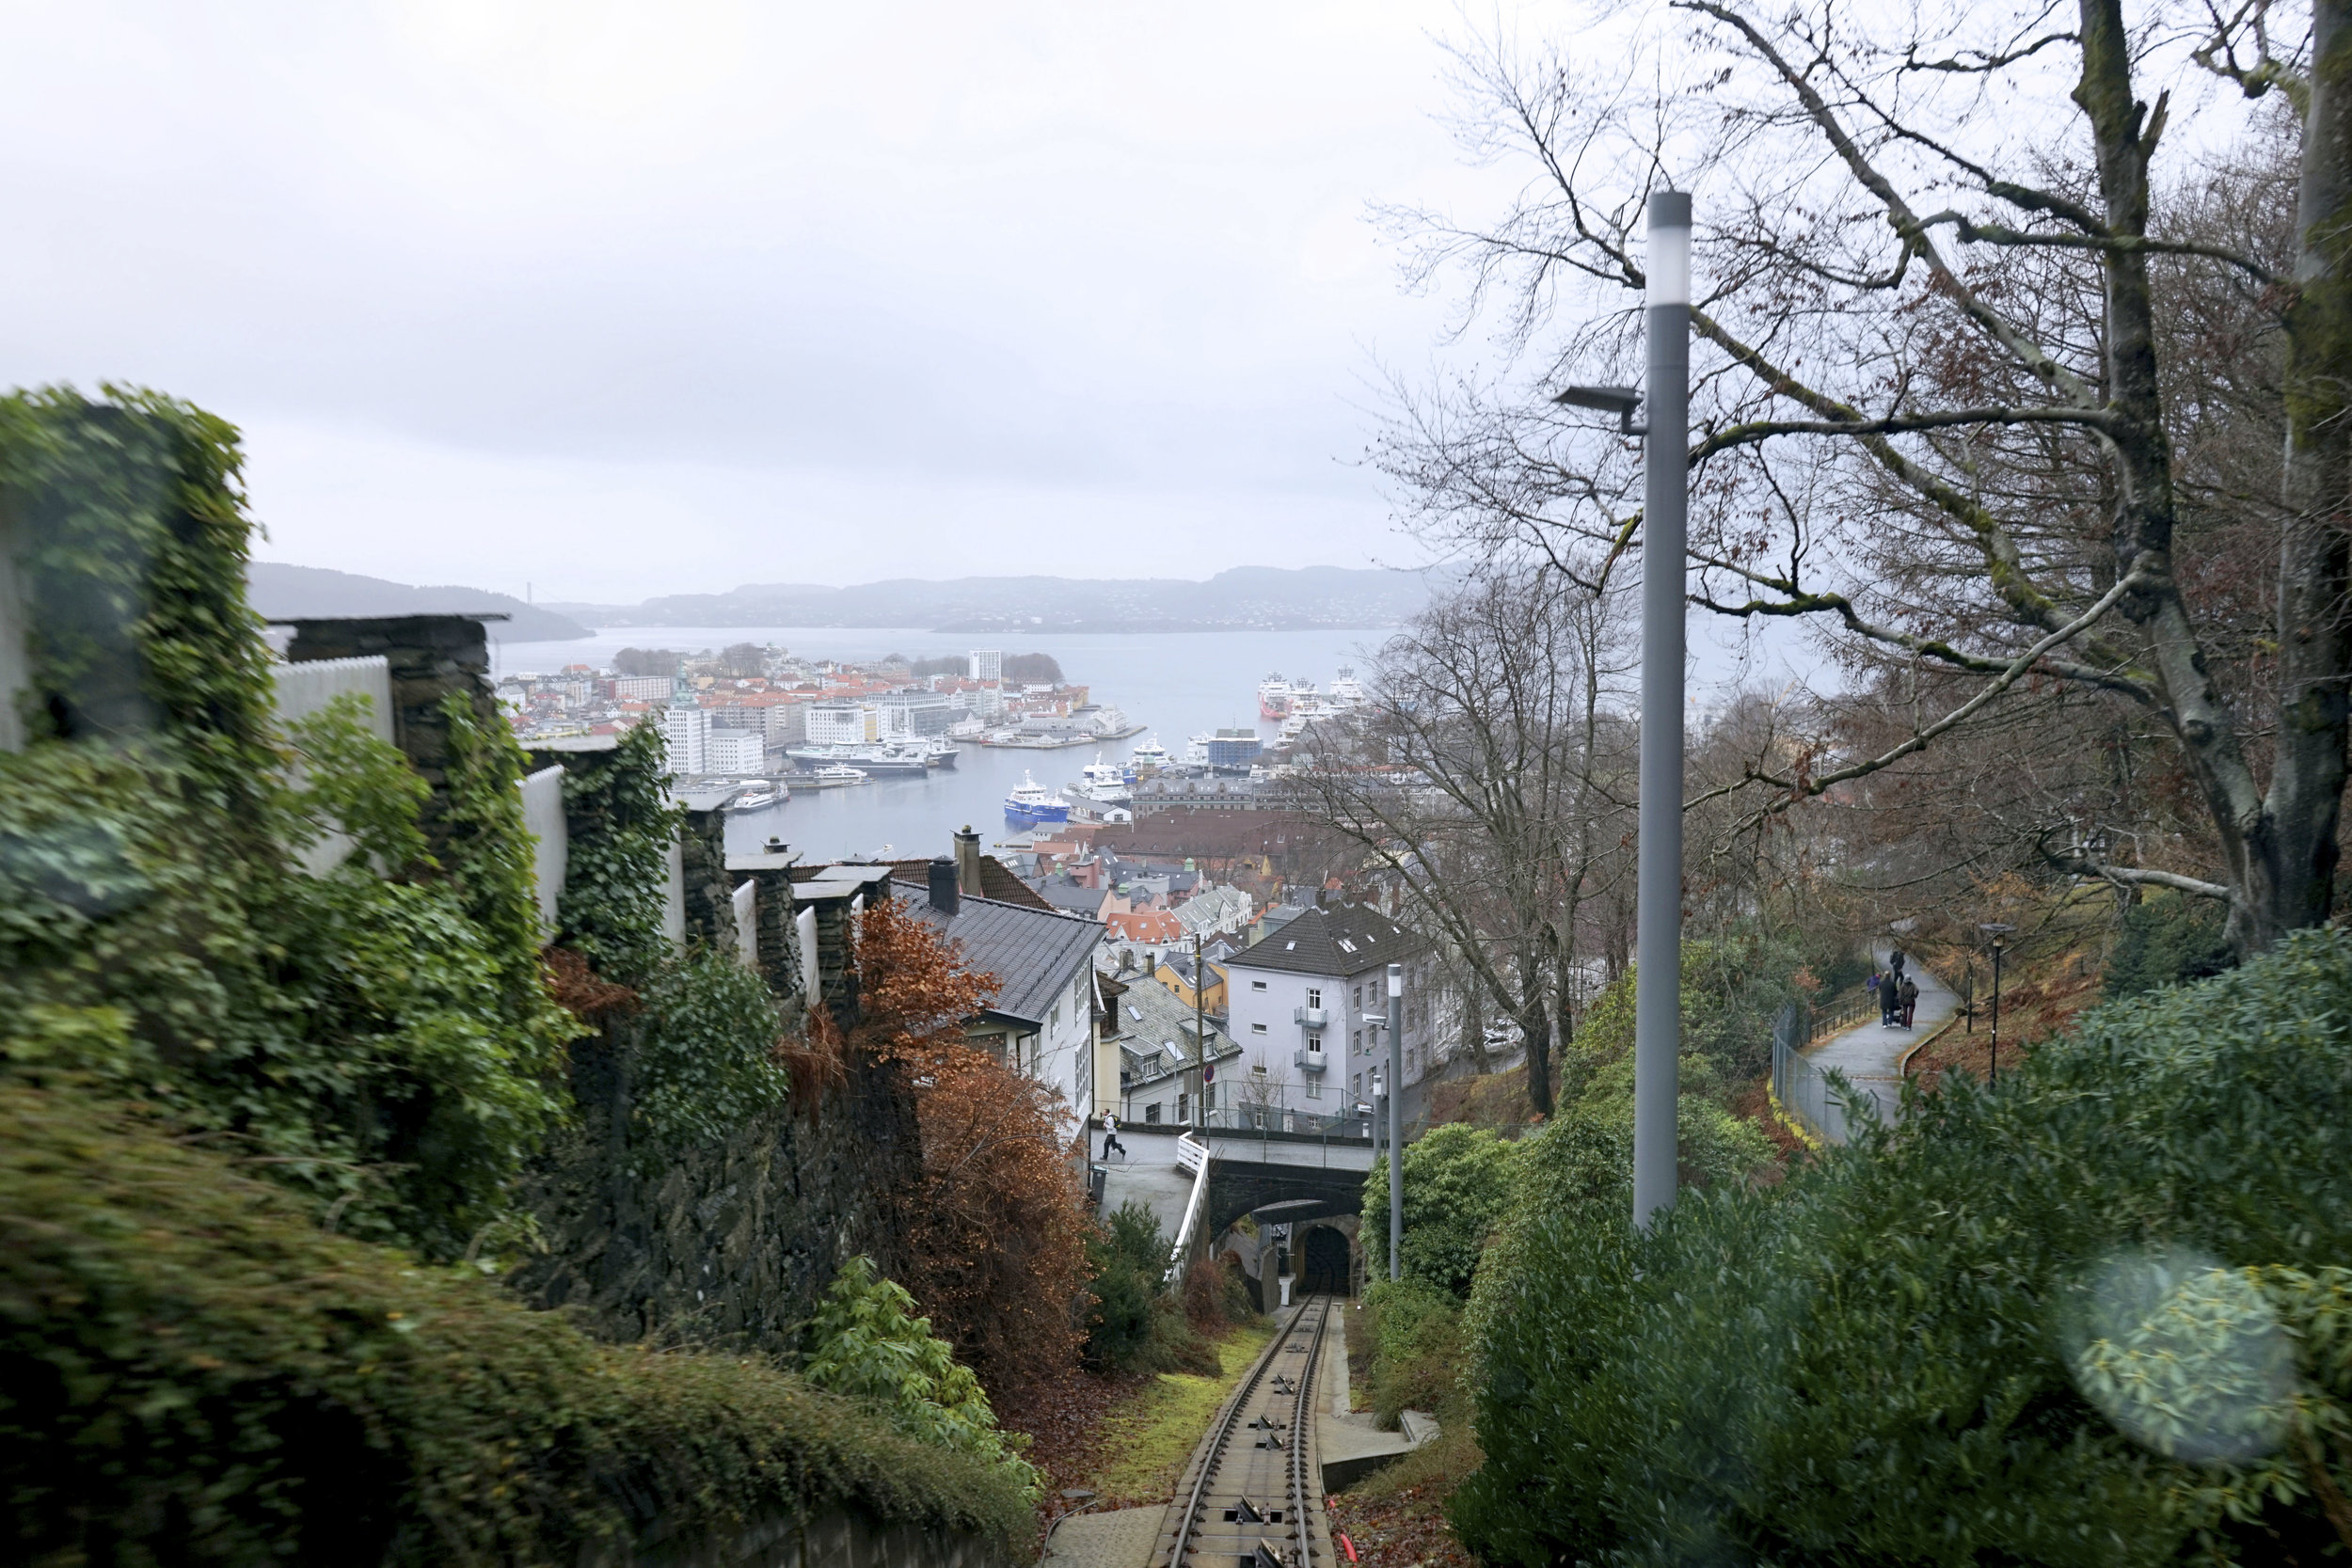 Krity S x Norway 2018_30.jpg